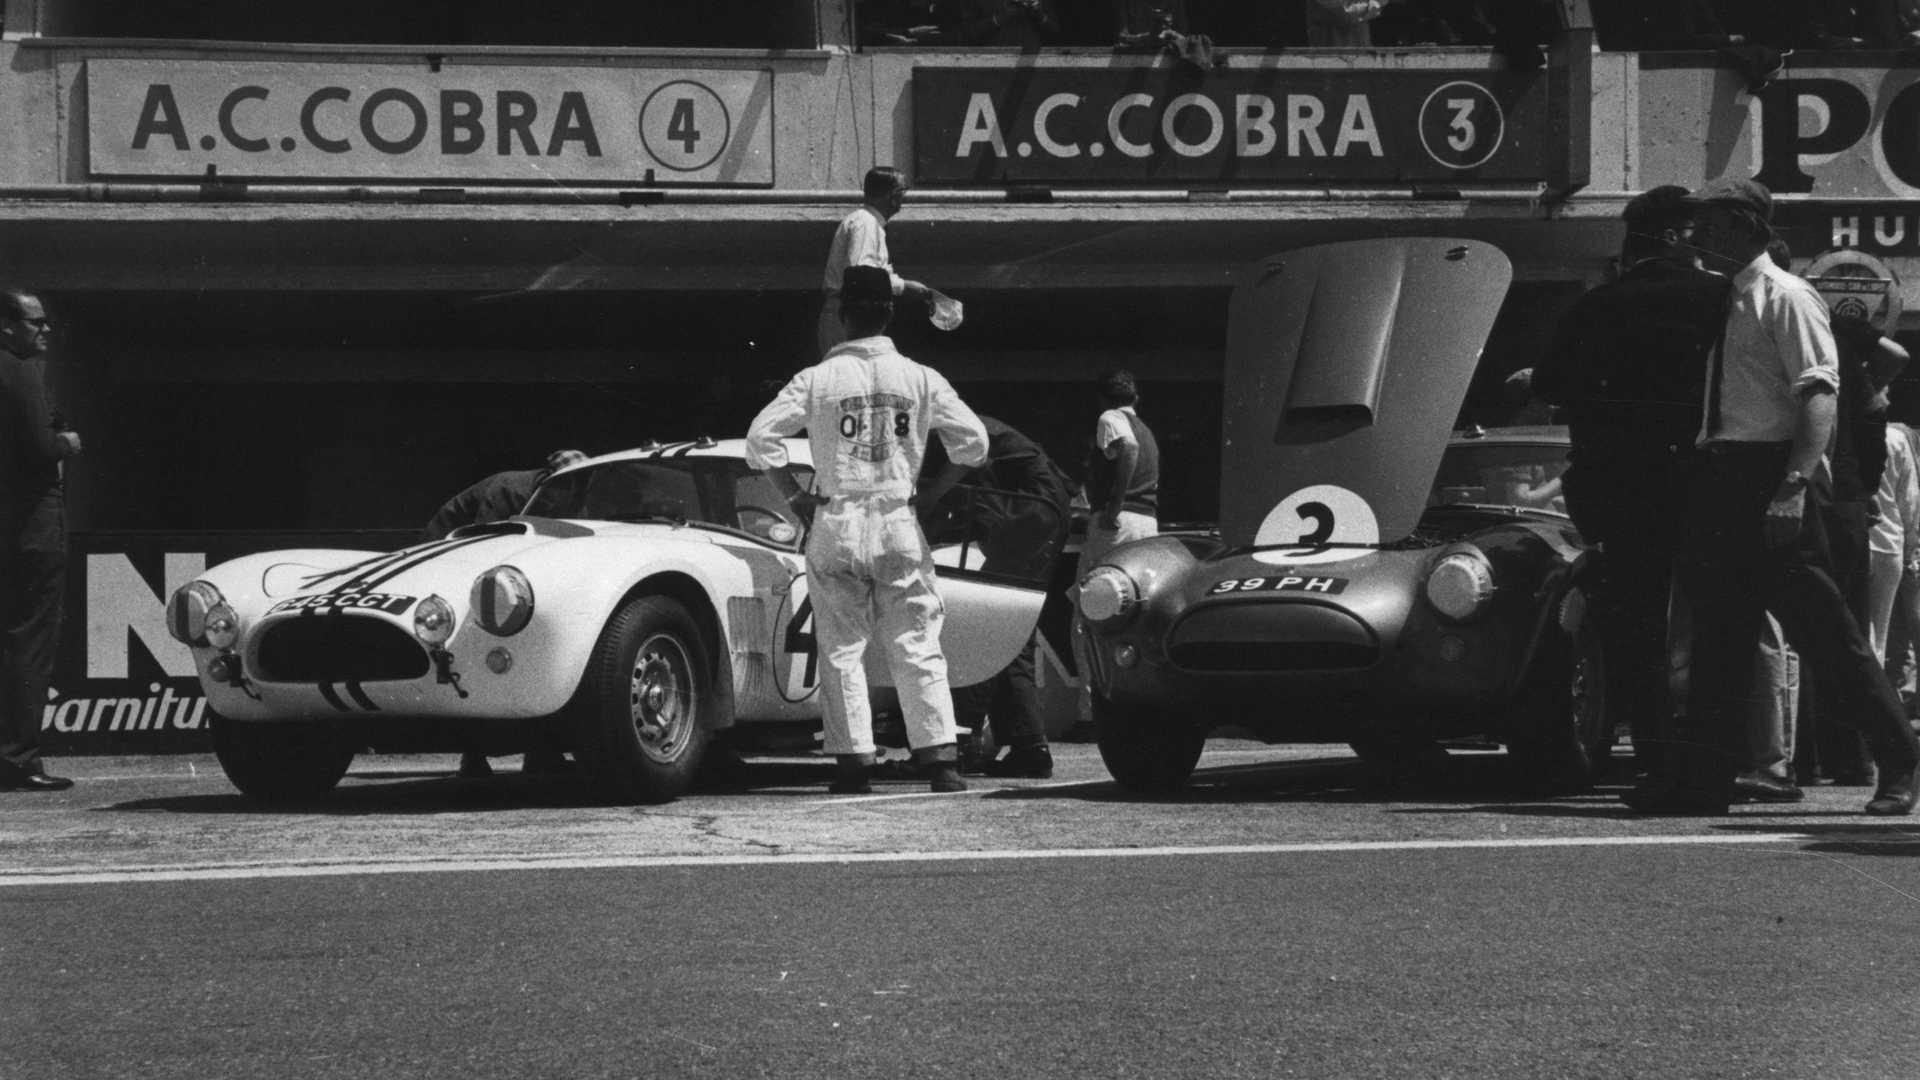 AC Cobra Le Mans Electric Announced